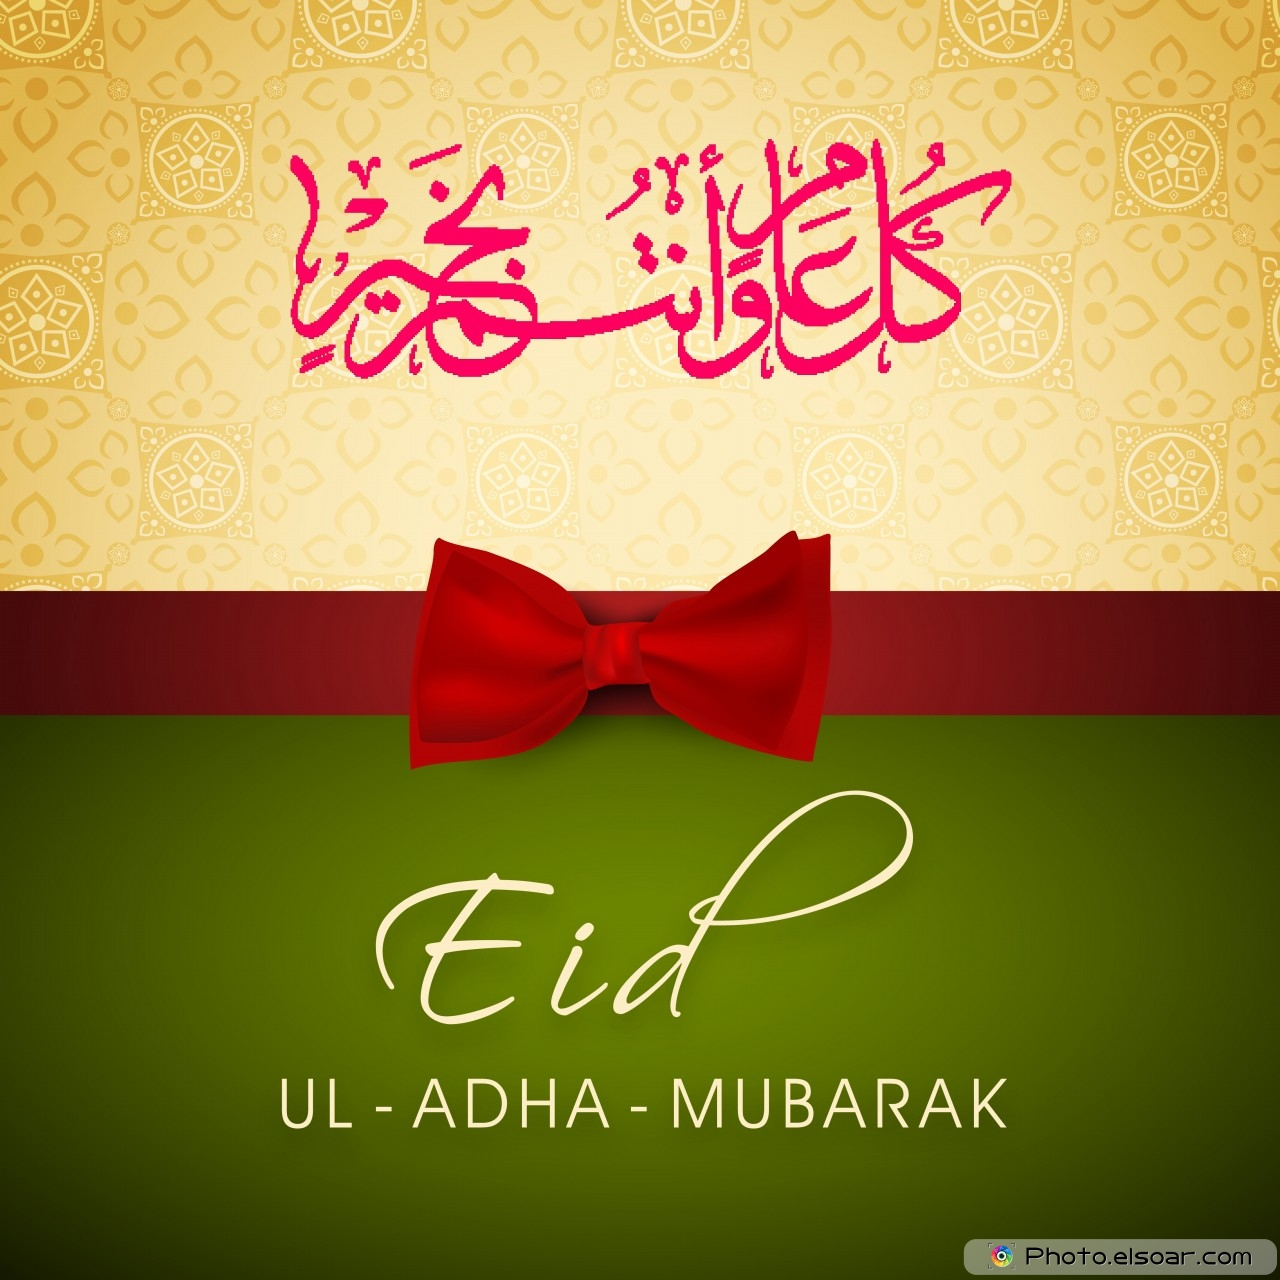 Eid Mubarak Wallpapers Greeting Cards For Eid Mubarak